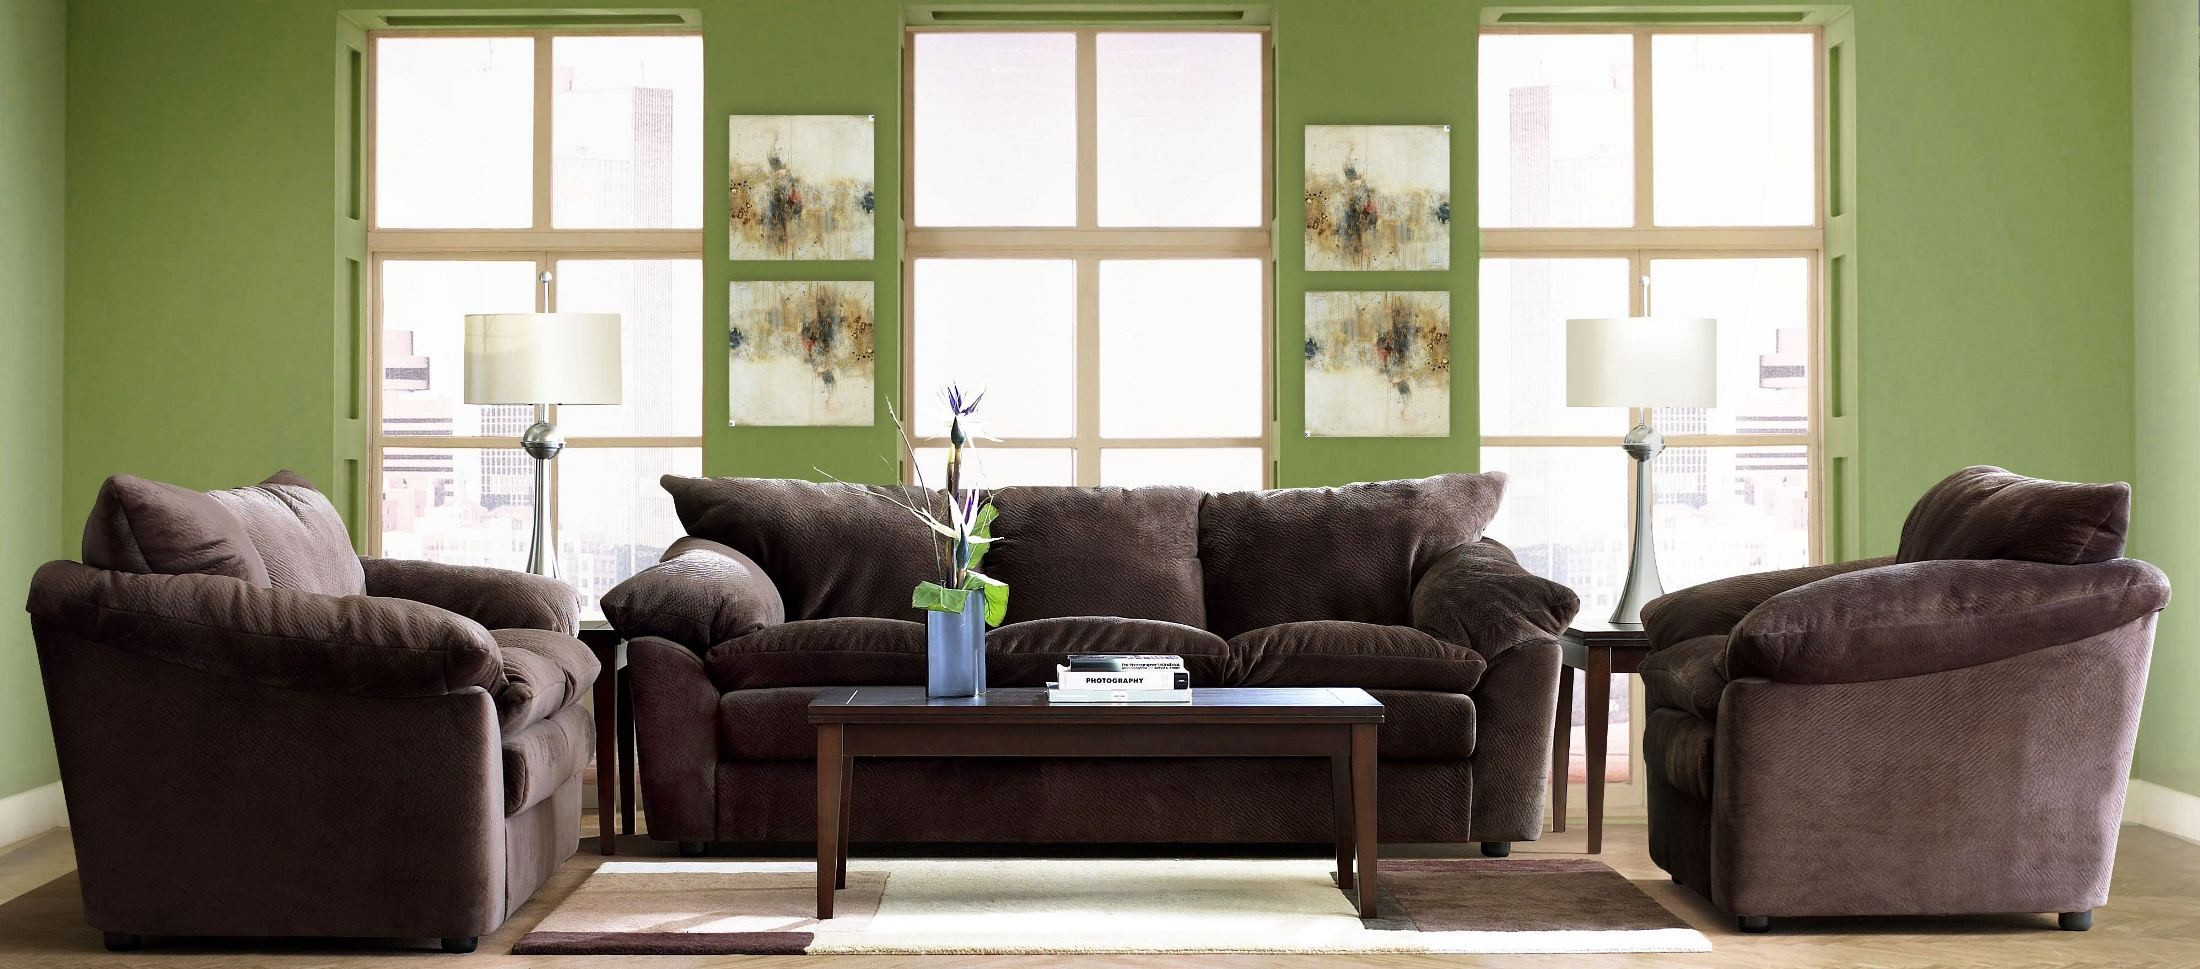 heights challenger chocolate living room set oe13 012013151785